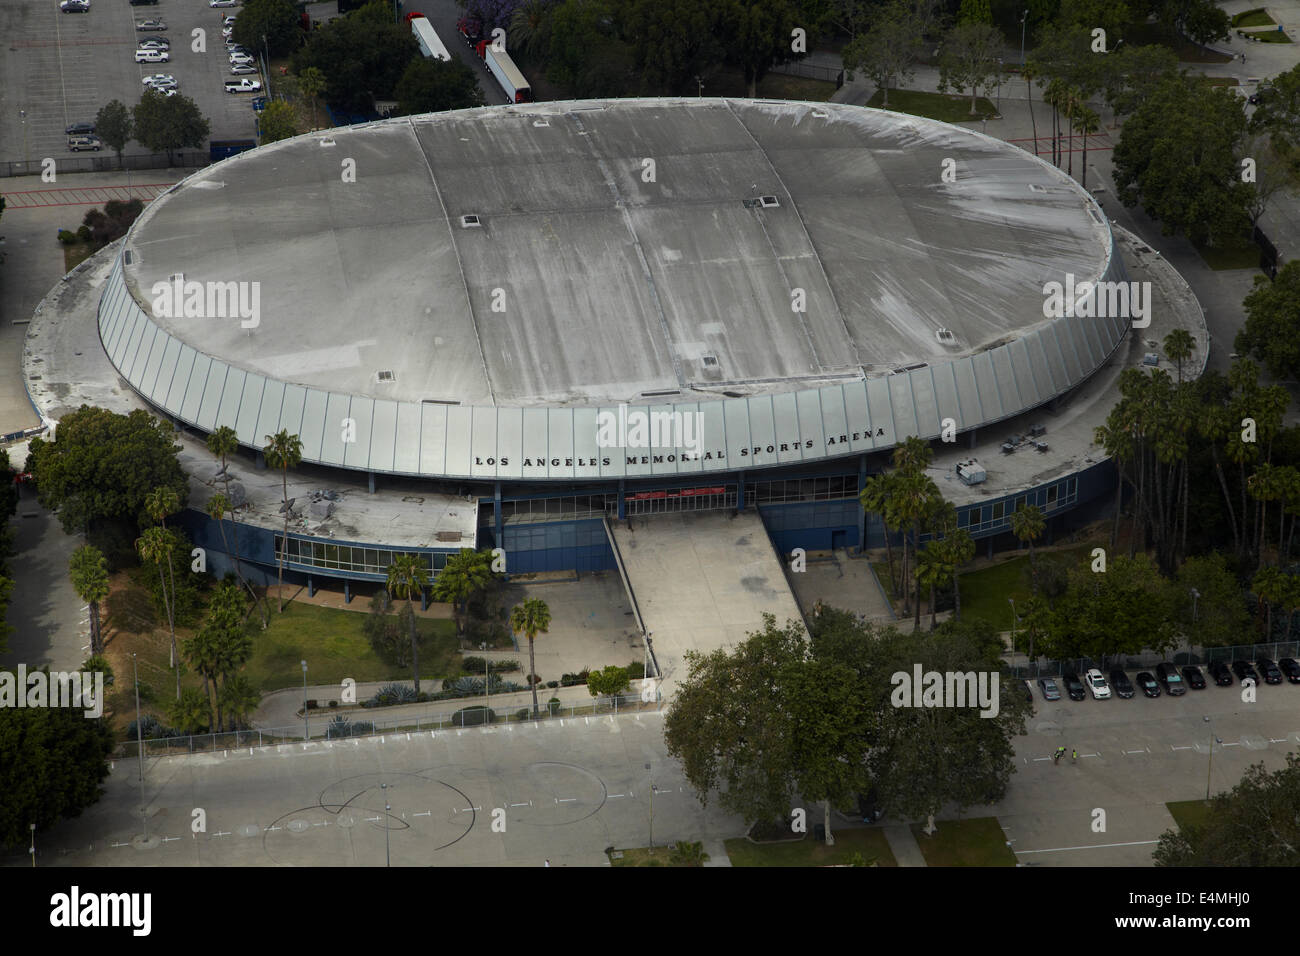 Los Angeles Memorial Sports Arena, Los Angeles, Californie, USA - vue aérienne Photo Stock